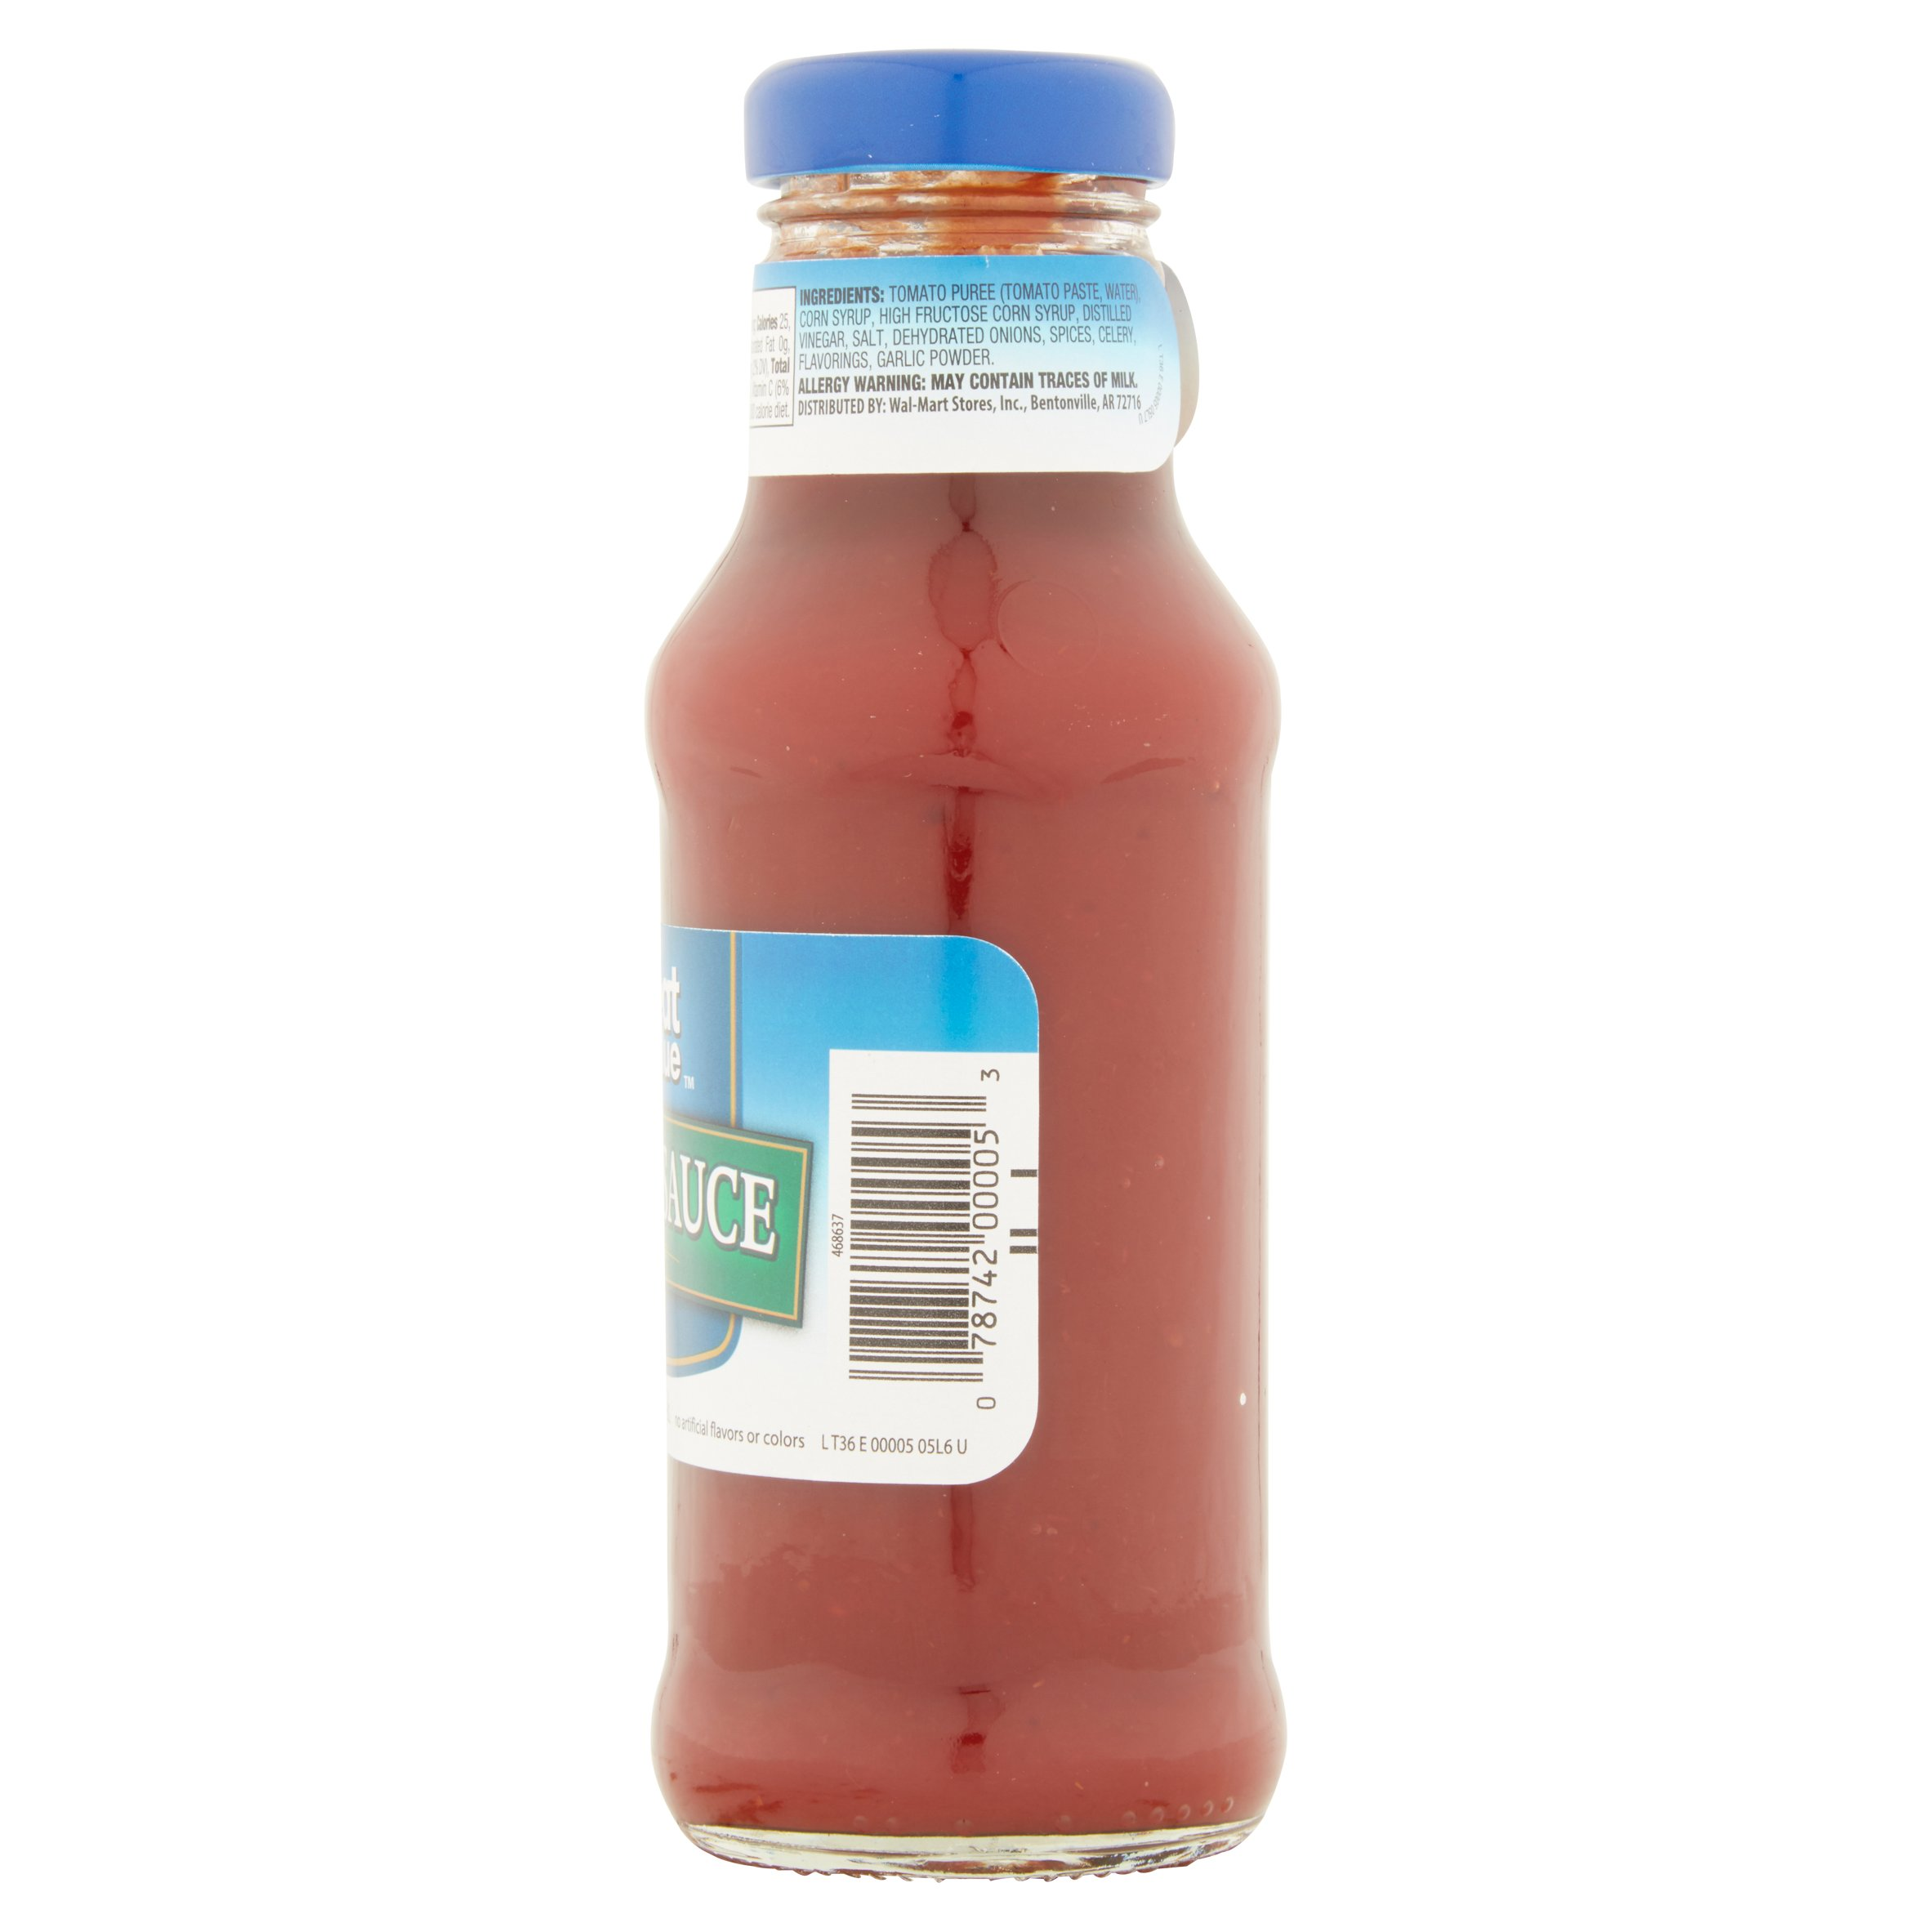 Great Value Chili Sauce, 12 fl oz - Walmart.com